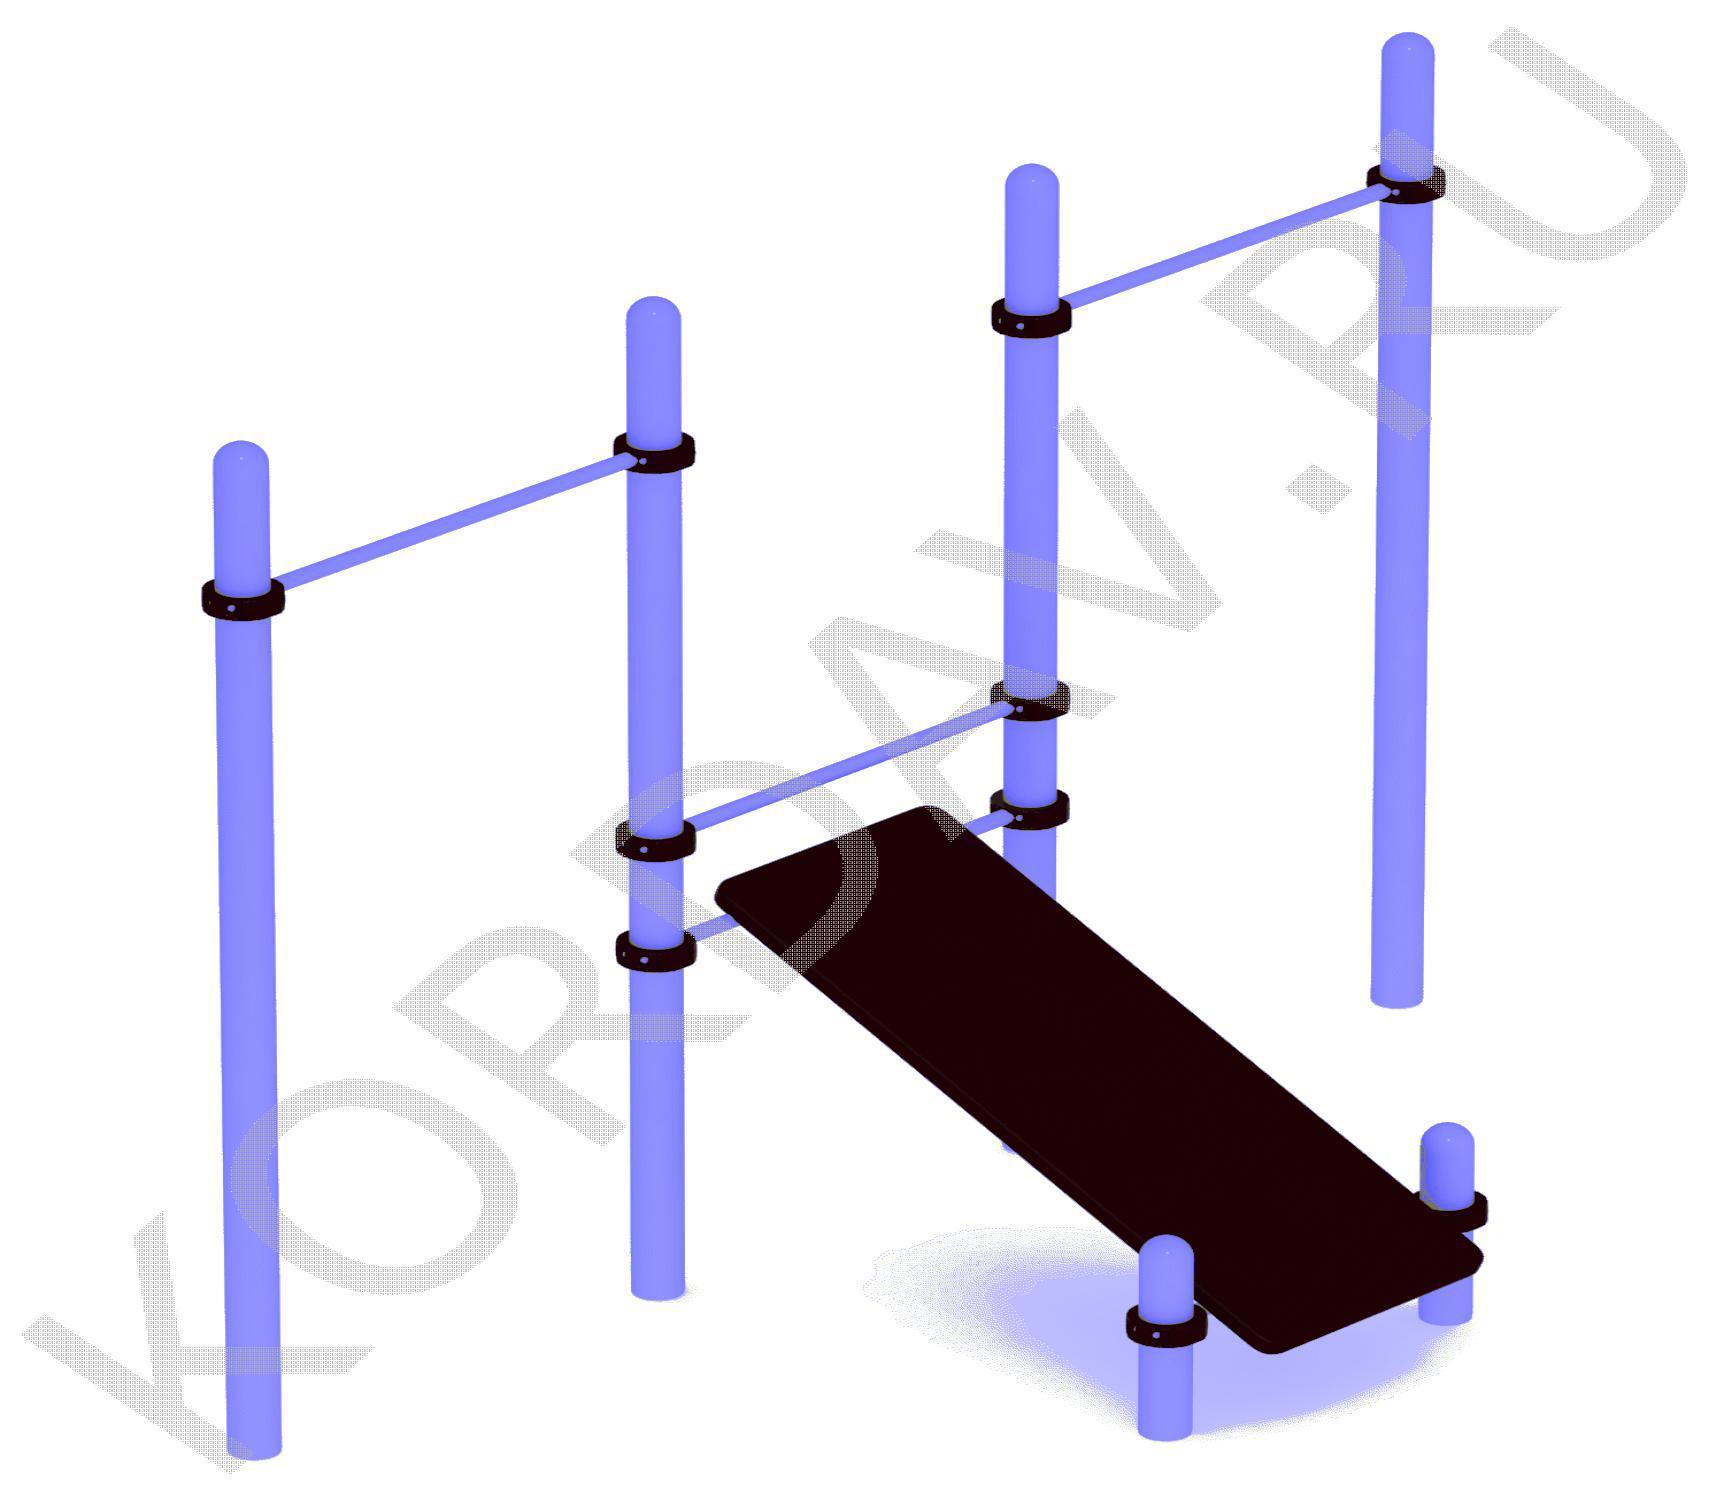 Наклонная скамья с двумя турниками (89 труба) СТ 1.271